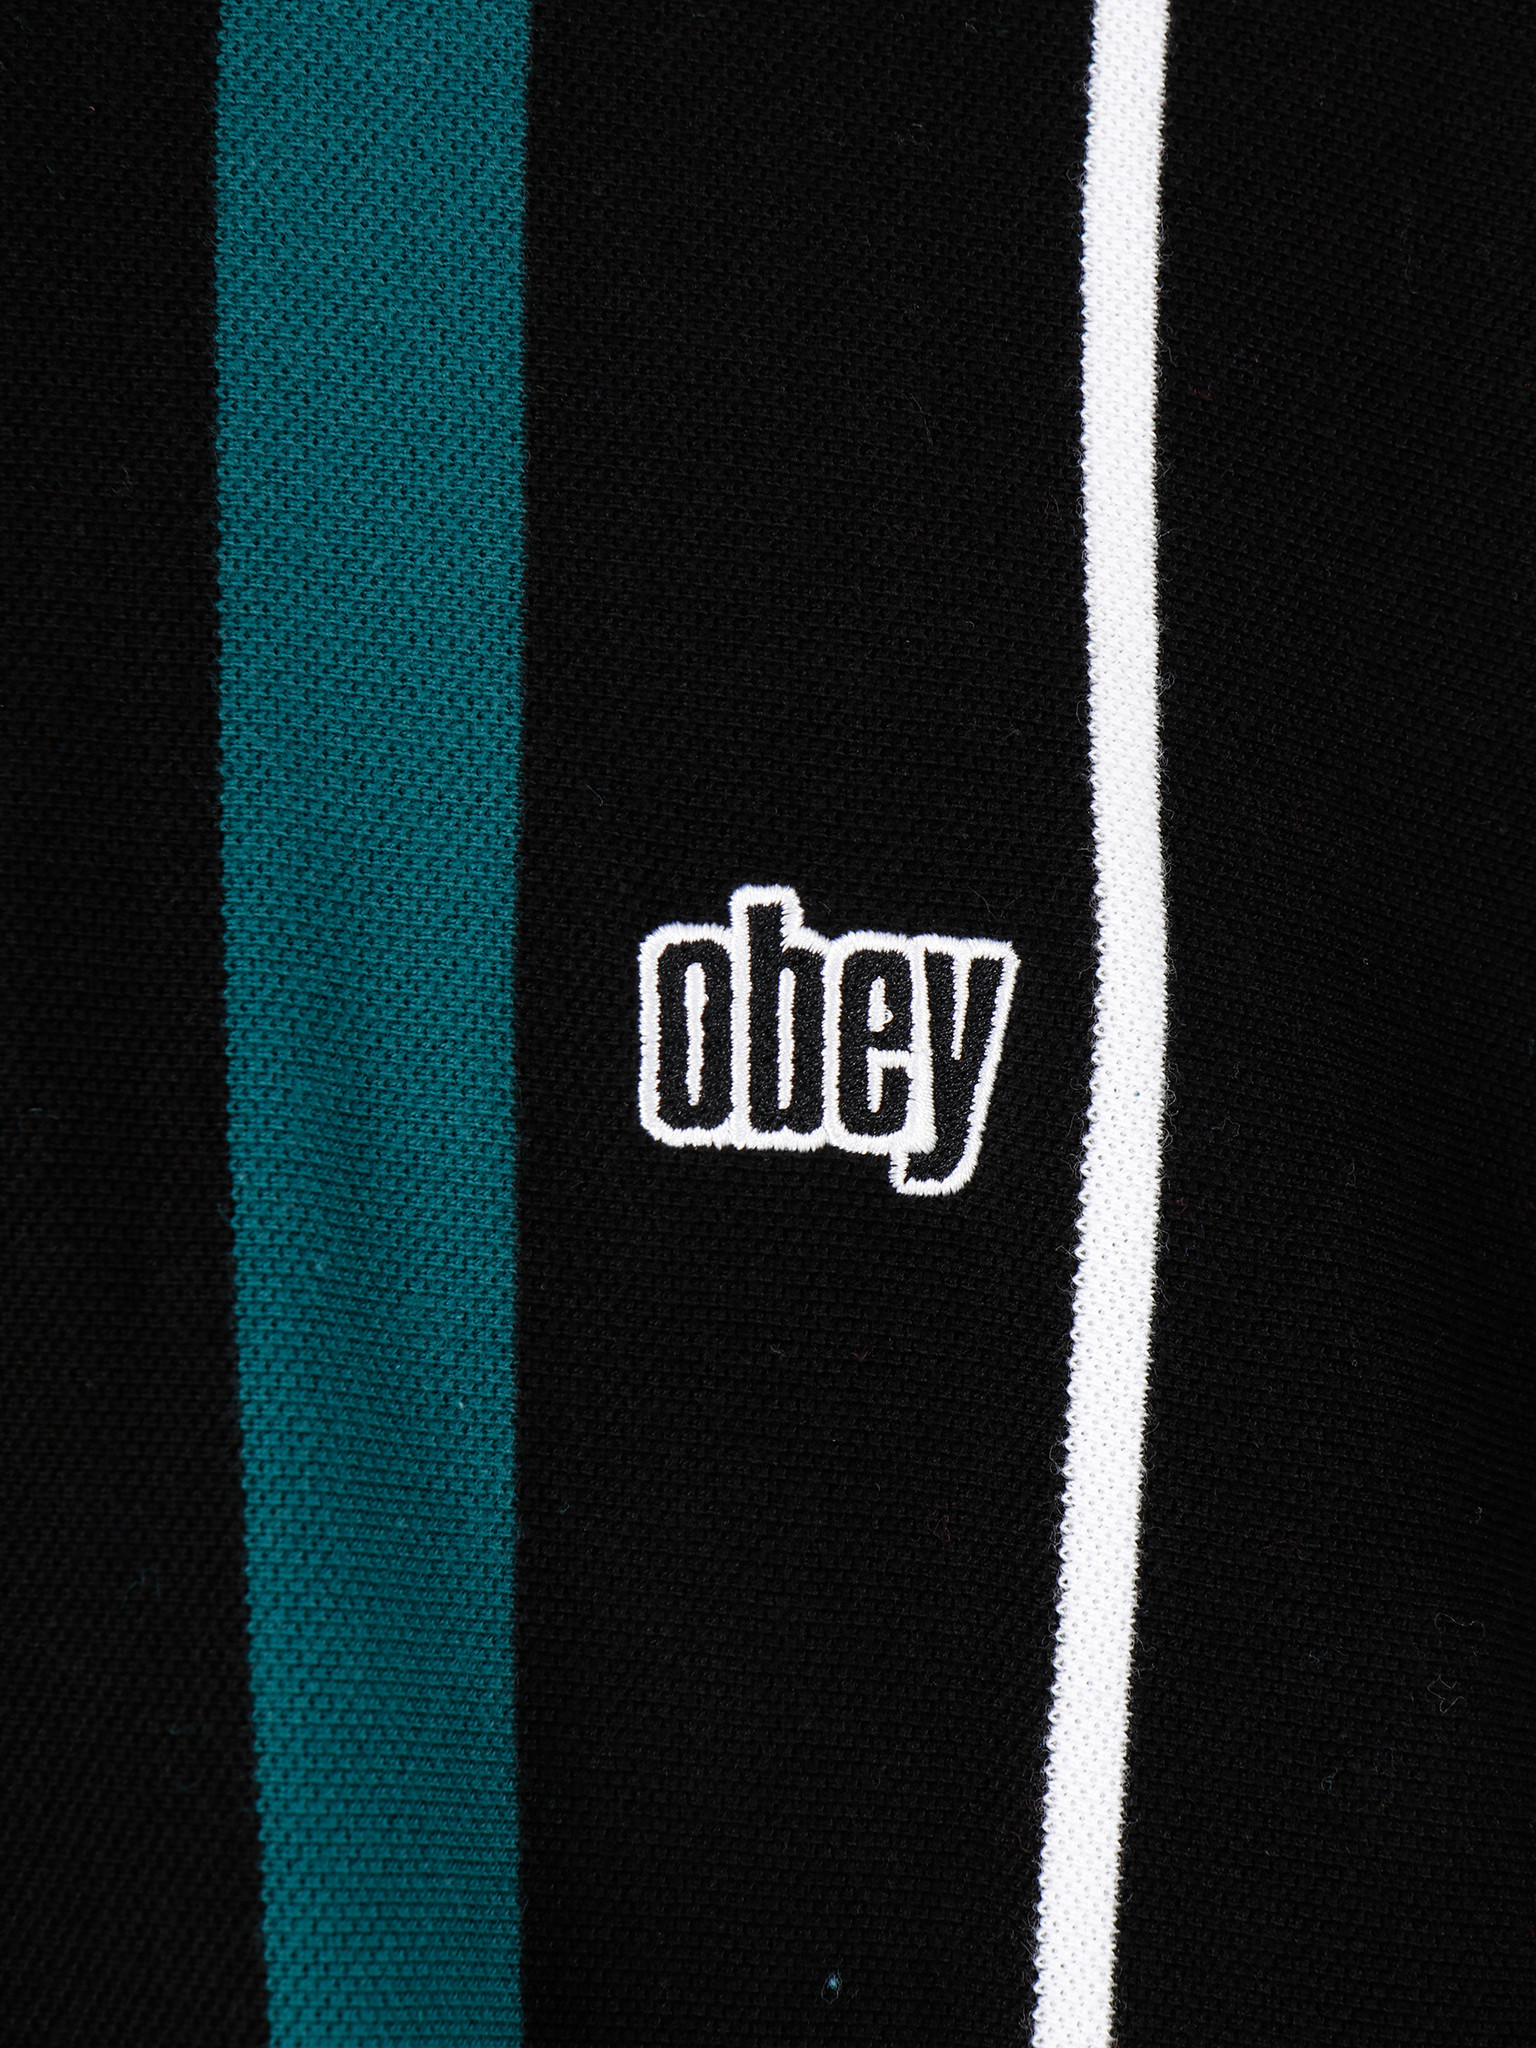 Obey Obey Chunk Classic Polo Shortsleeve Black Multi 131080253-BKM